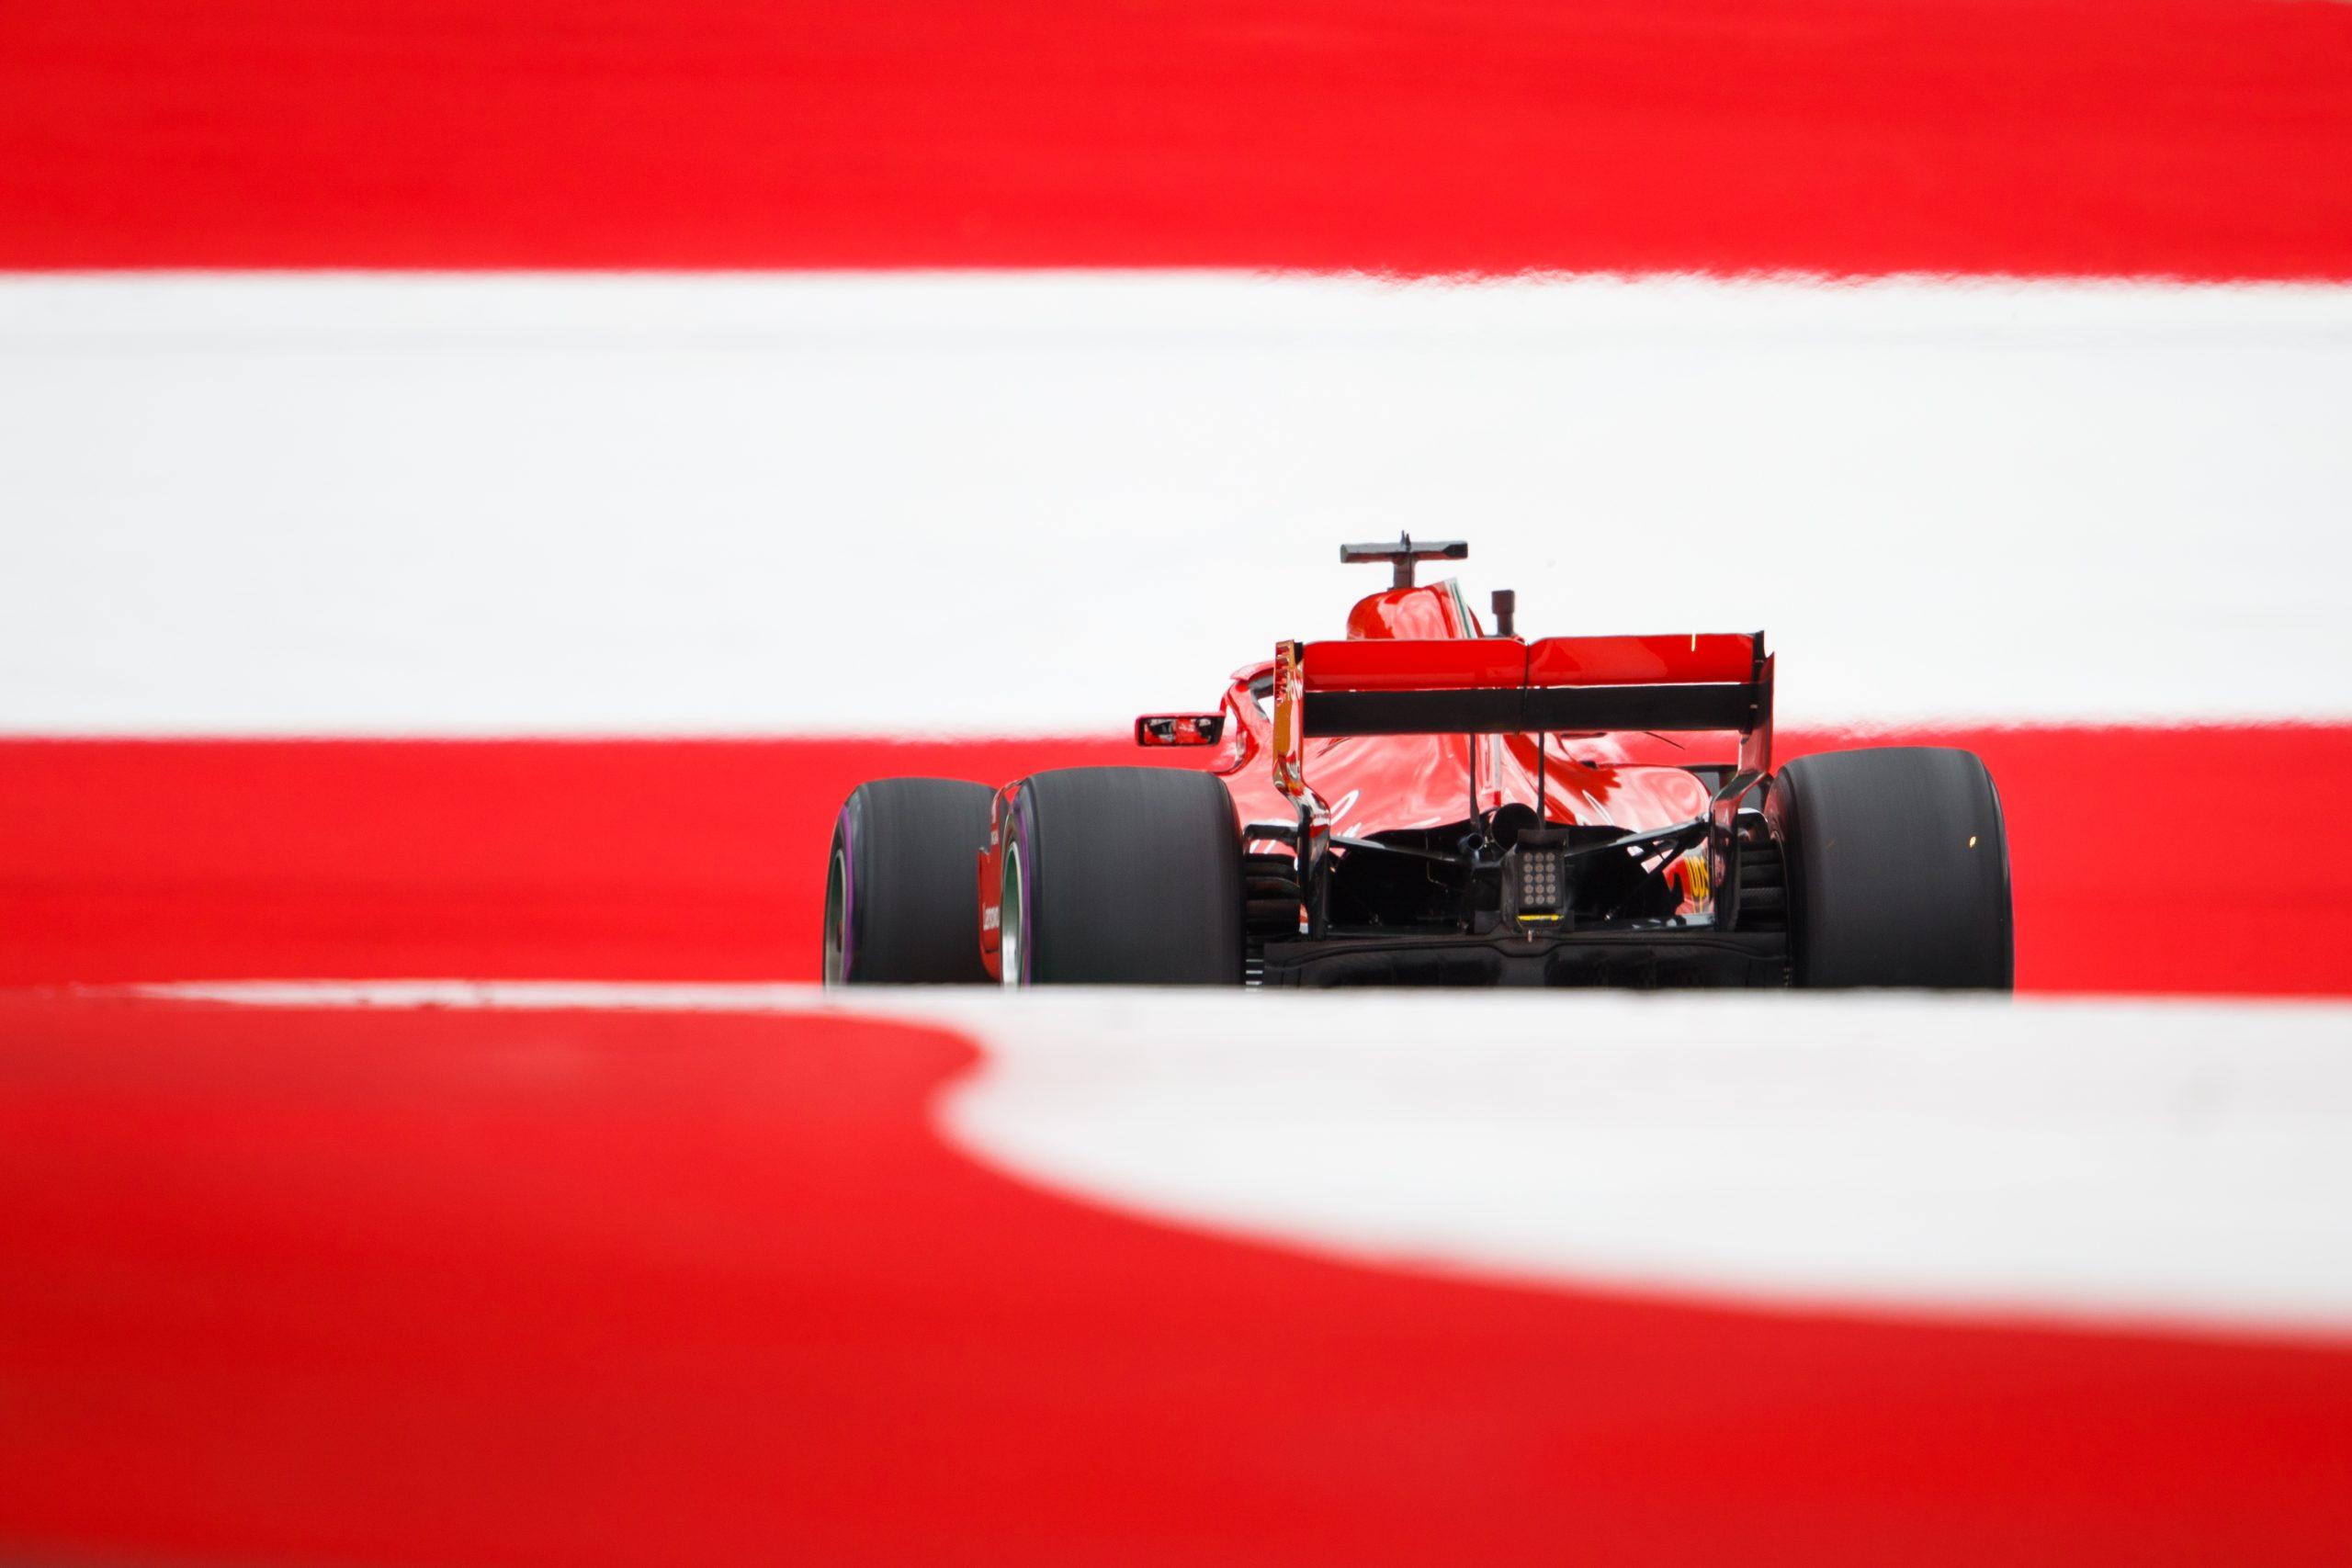 F1 – AUSTRIA GRAND PRIX 2018